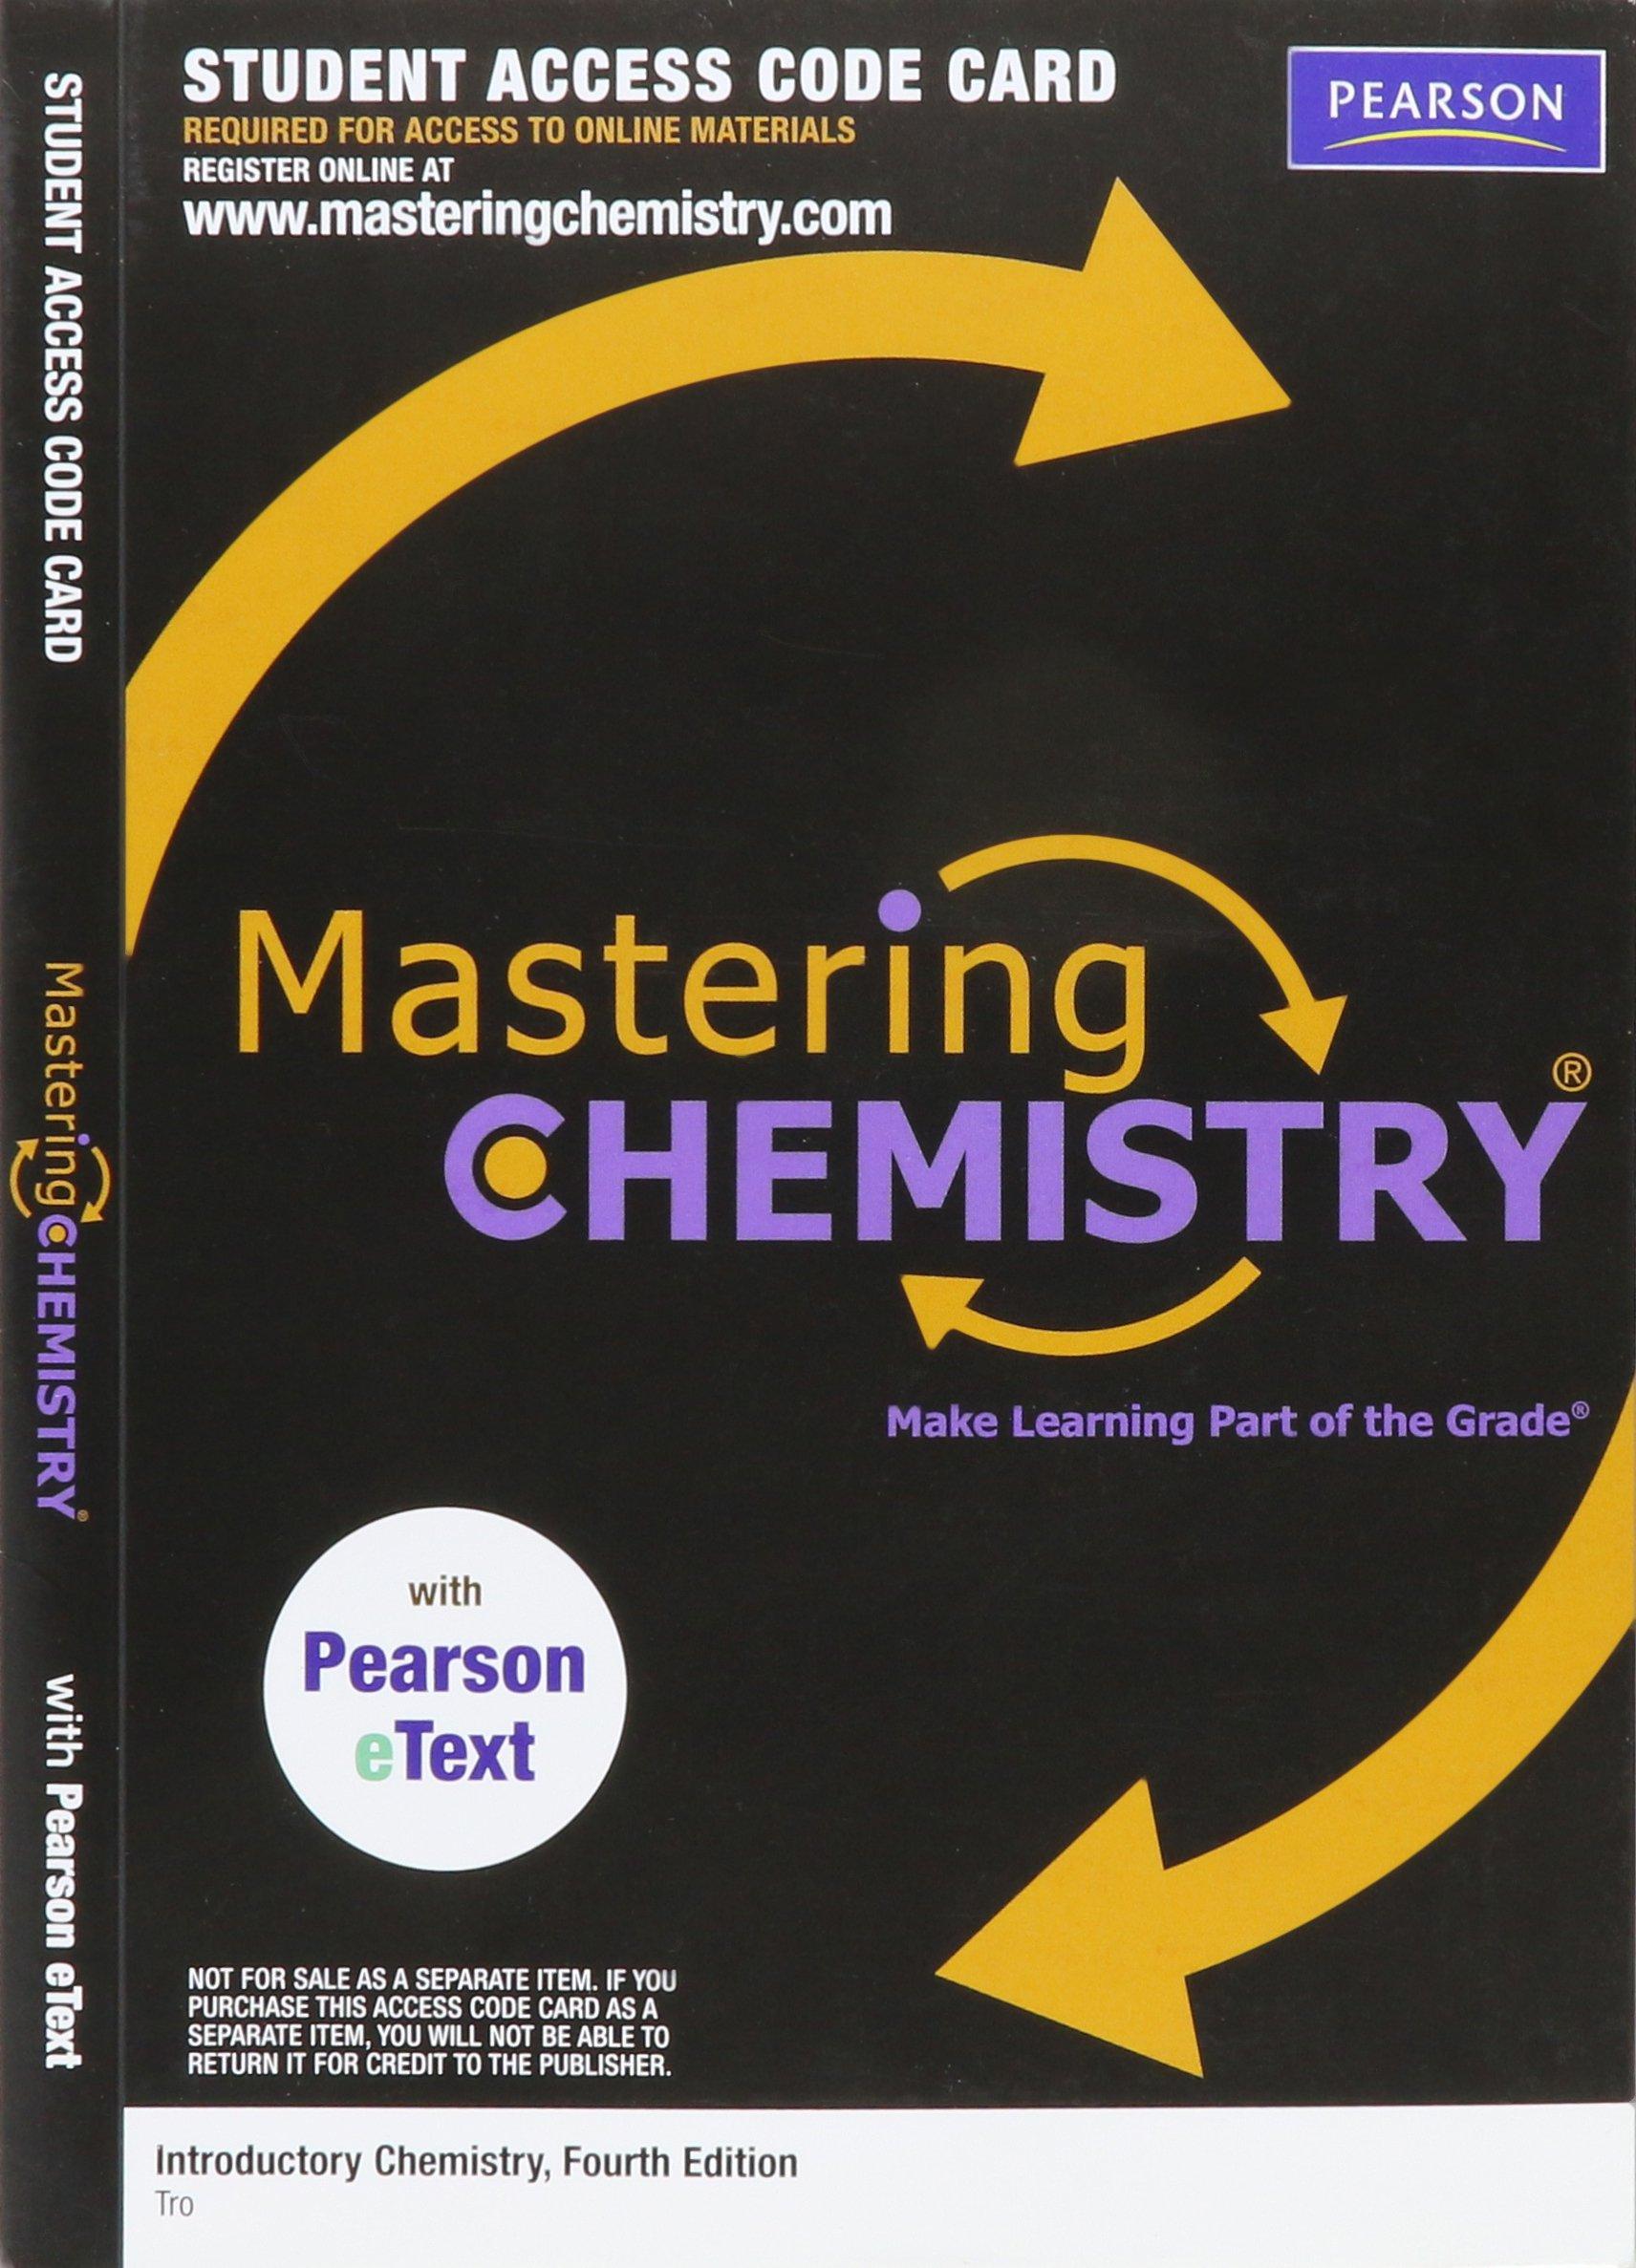 Mastering chemistry access code nivaldo j tro 9780321730022 mastering chemistry access code nivaldo j tro 9780321730022 amazon books fandeluxe Choice Image